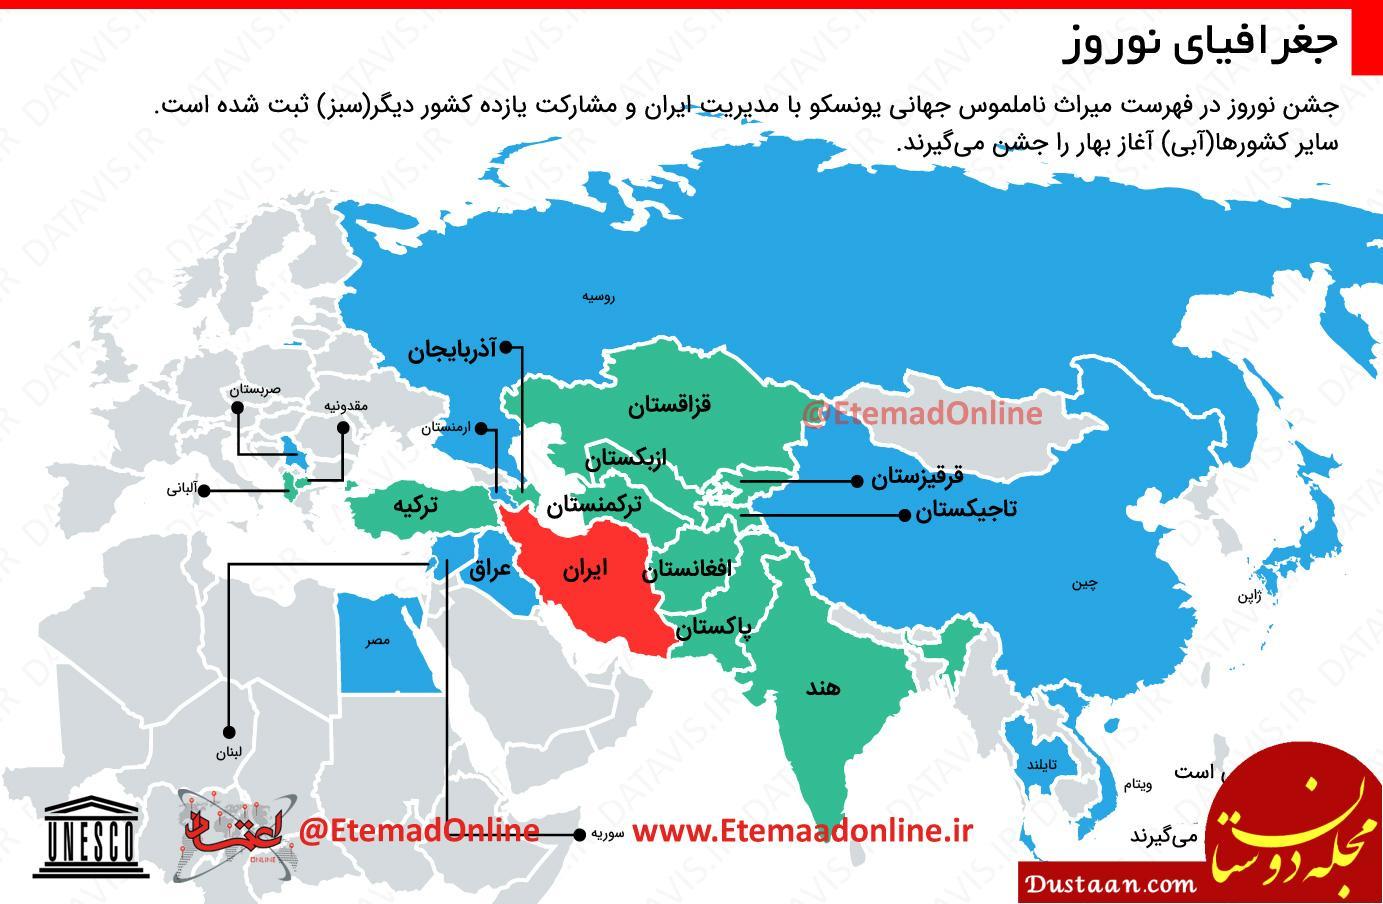 www.dustaan.com نوروز را کدام کشورها جشن می گیرند؟ +اینفوگرافیک